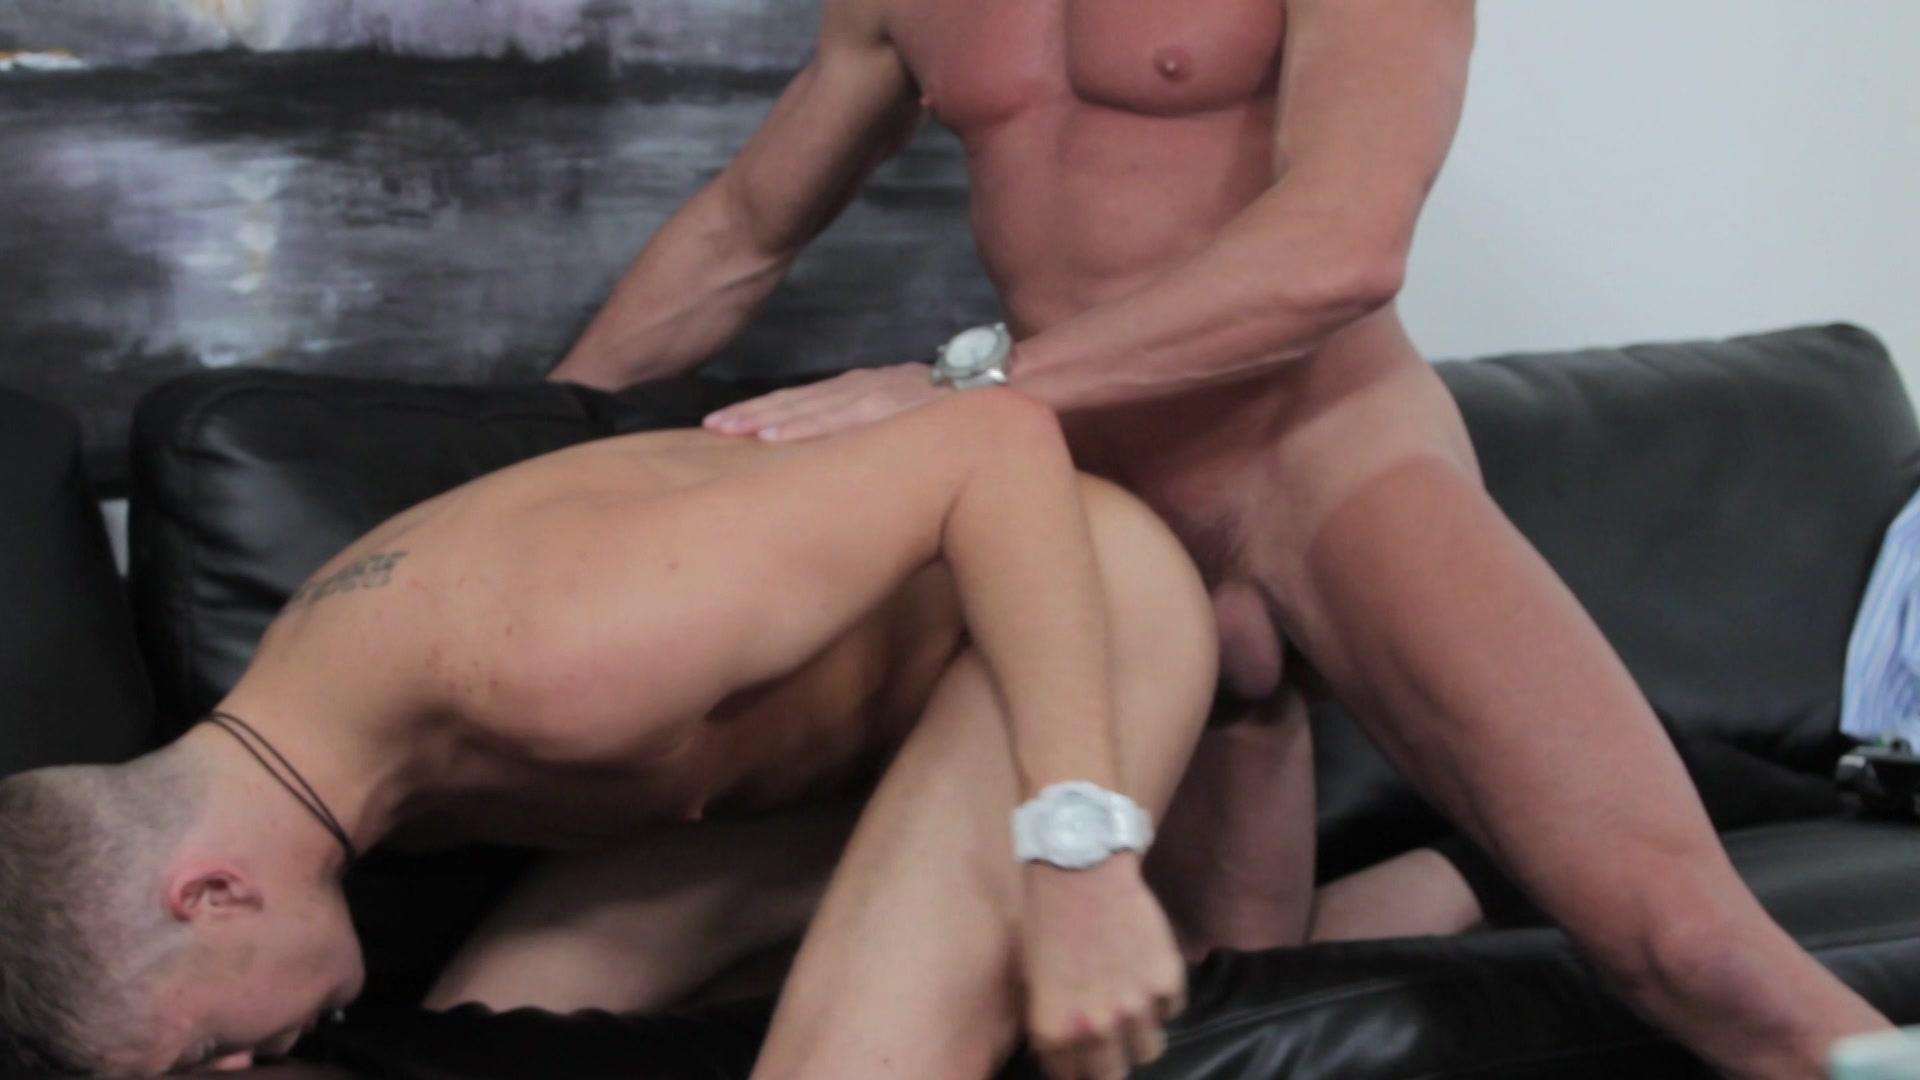 craig the casting room porno gratis video gay